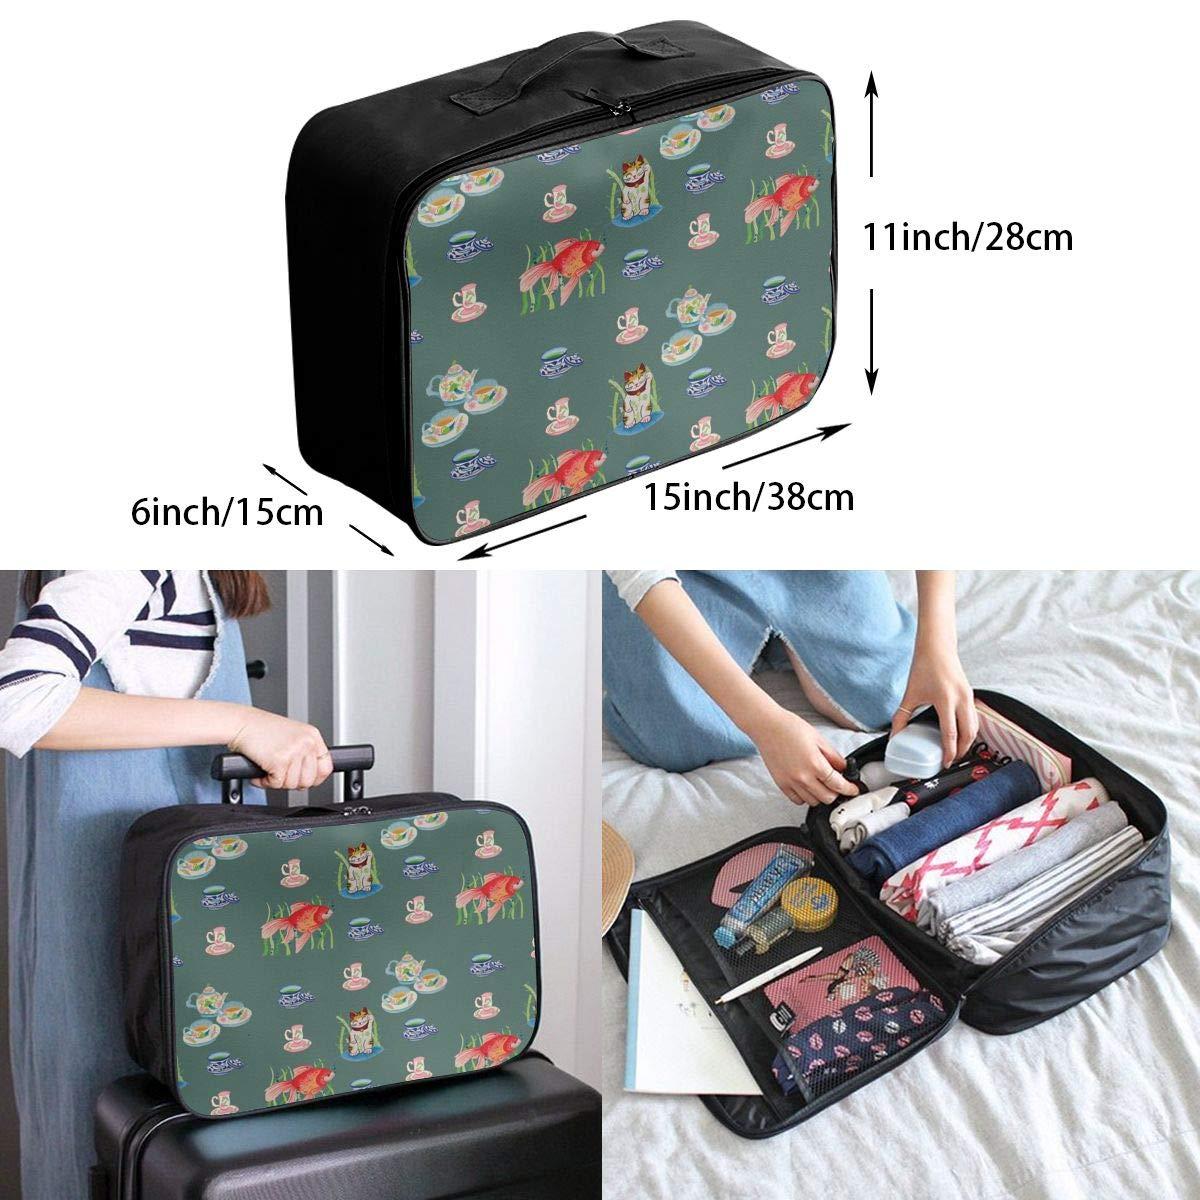 Travel Luggage Duffle Bag Lightweight Portable Handbag Cat Fish Pattern Large Capacity Waterproof Foldable Storage Tote